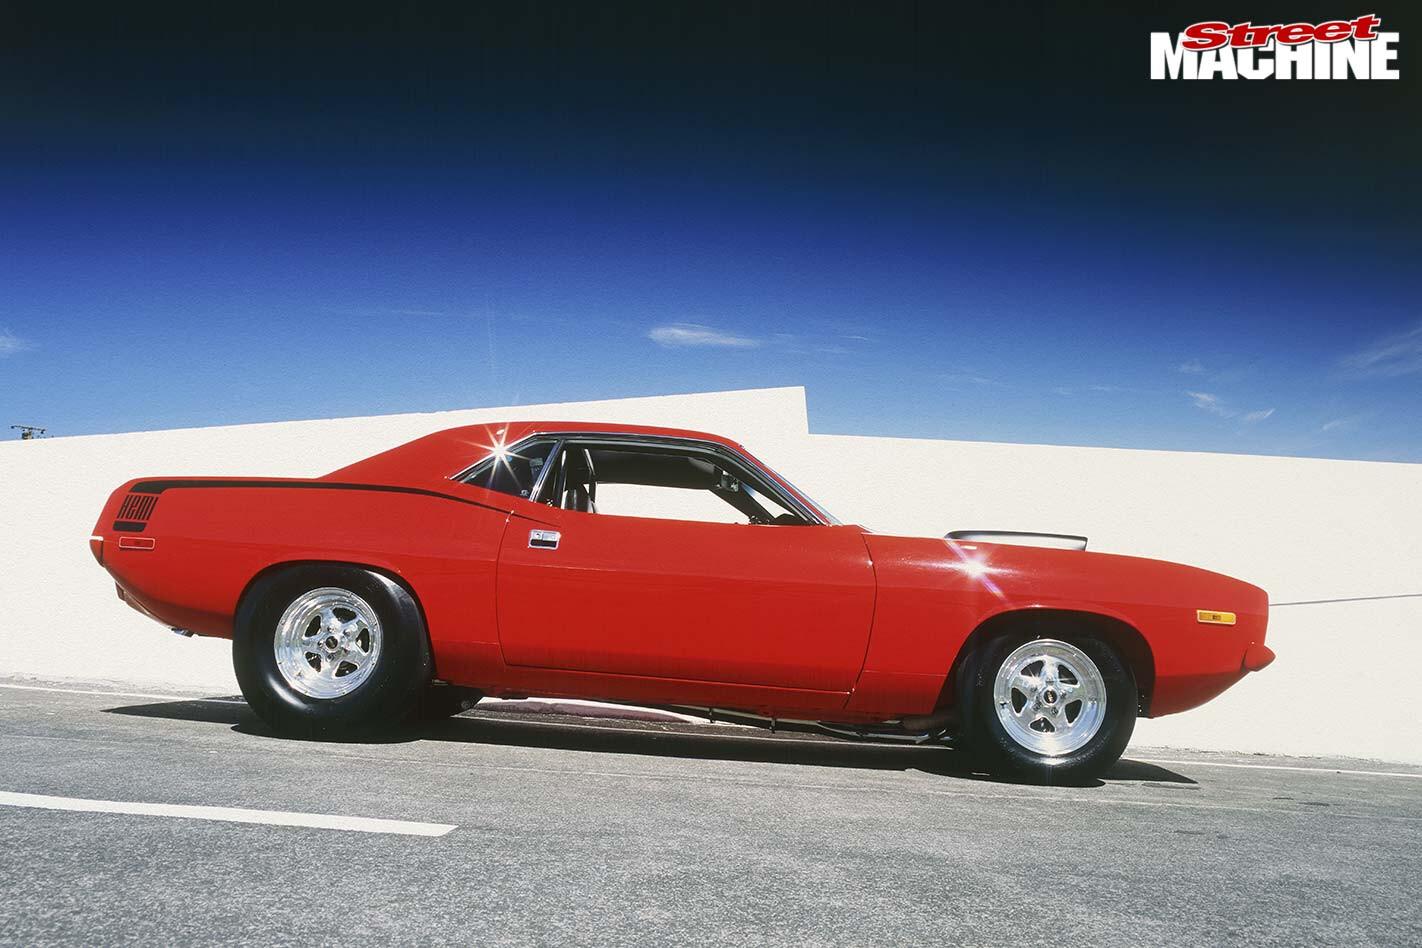 Plymouth Barracuda side